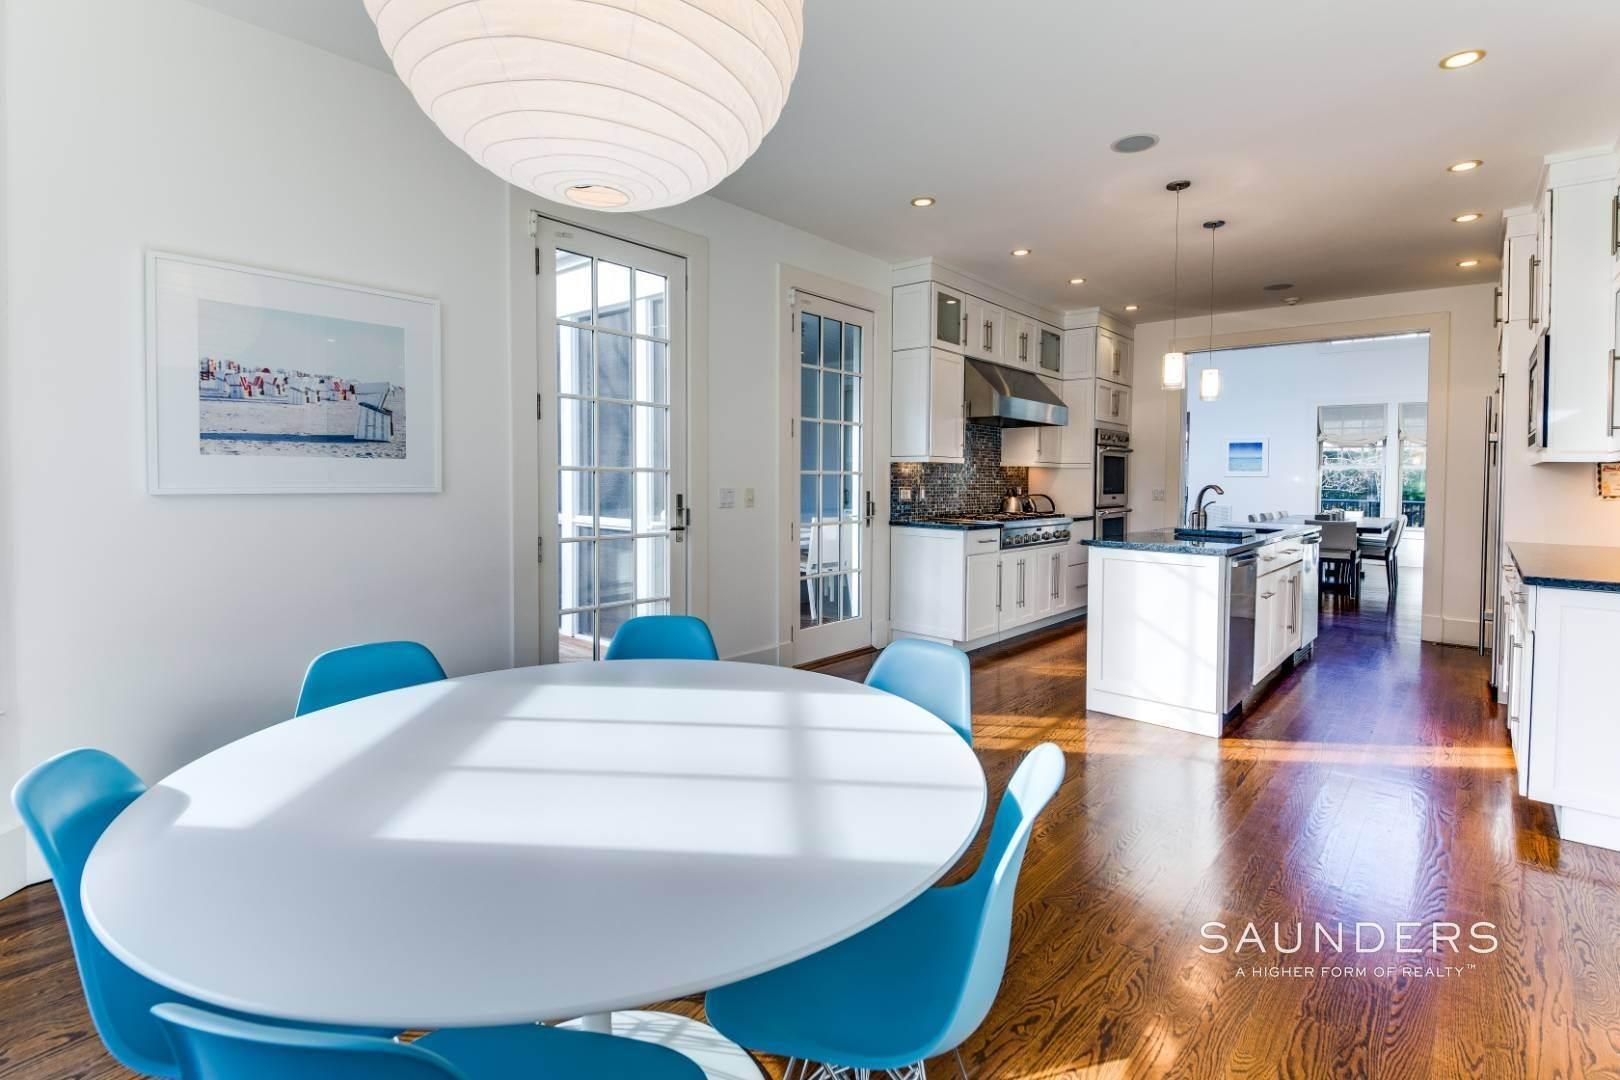 9. Single Family Homes for Sale at Wainscott South Traditional Near Beach Lane 10 Merriwood Drive, Wainscott, East Hampton Town, NY 11975